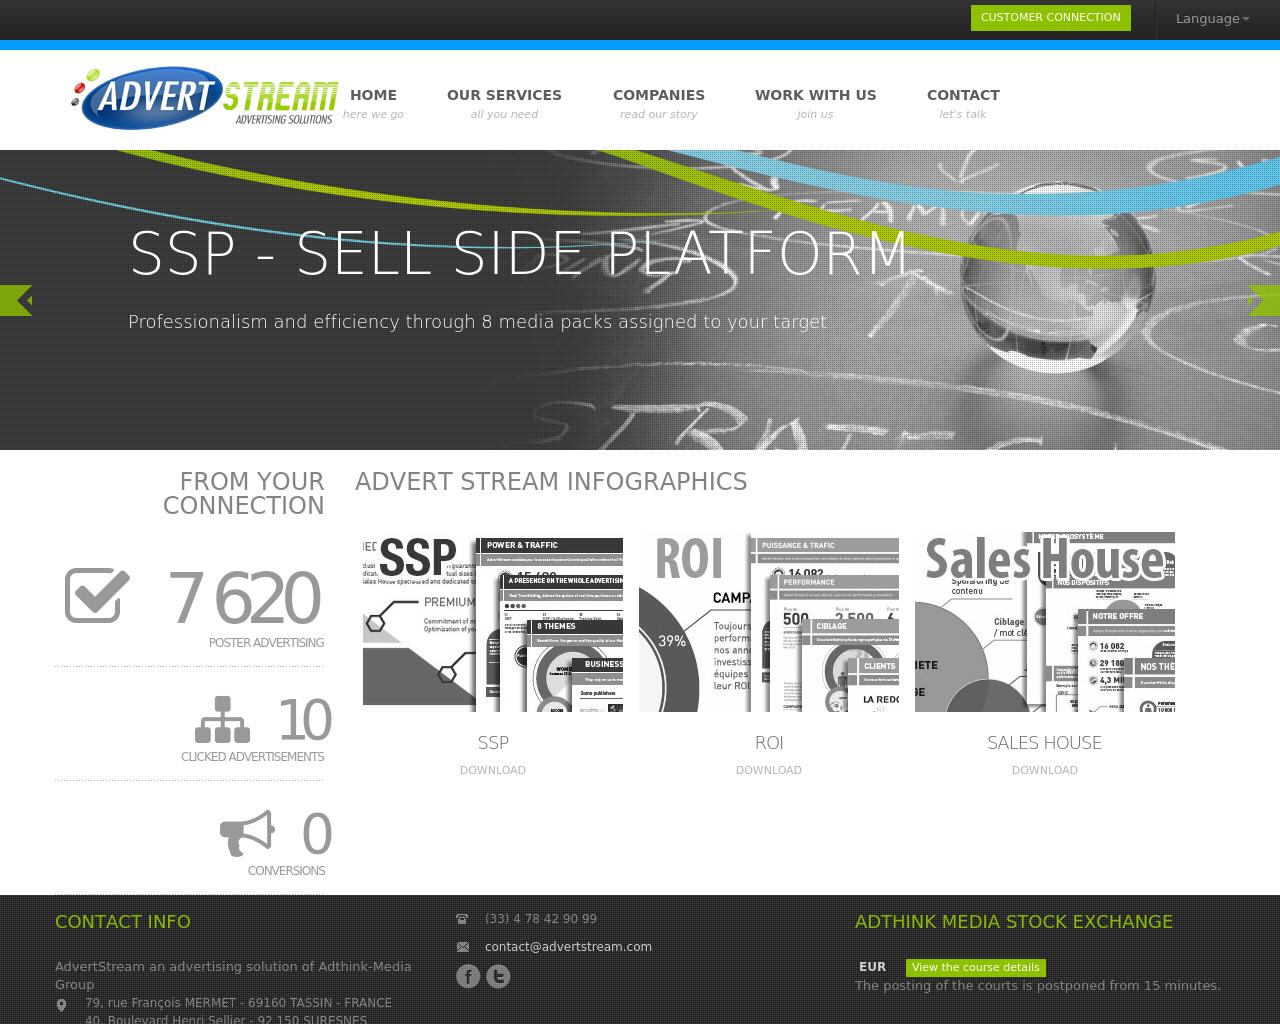 AdvertStream-Advertising-Reviews-Pricing